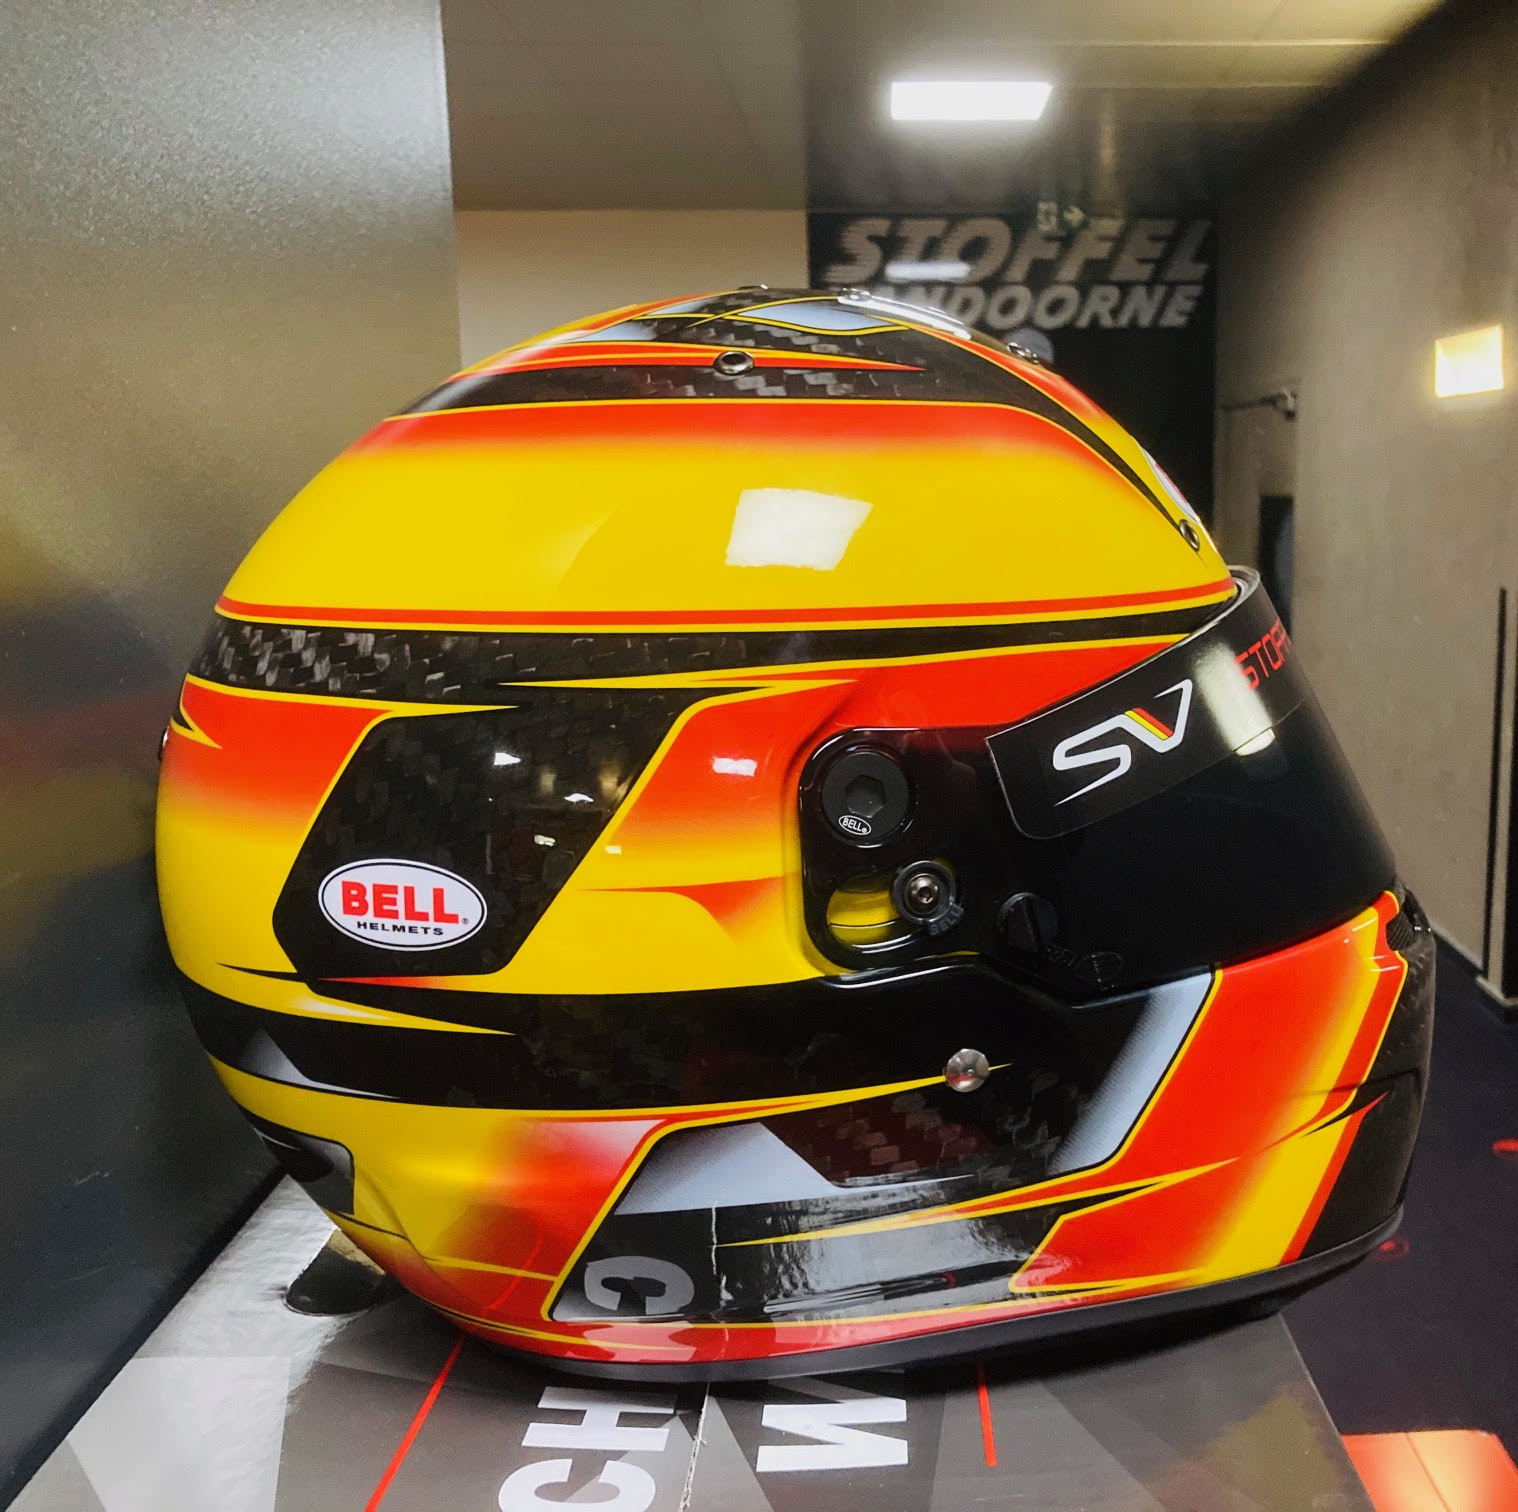 Bell Helmets F1 Replica Helm 1:1 Stoffel Vandoorne 2018